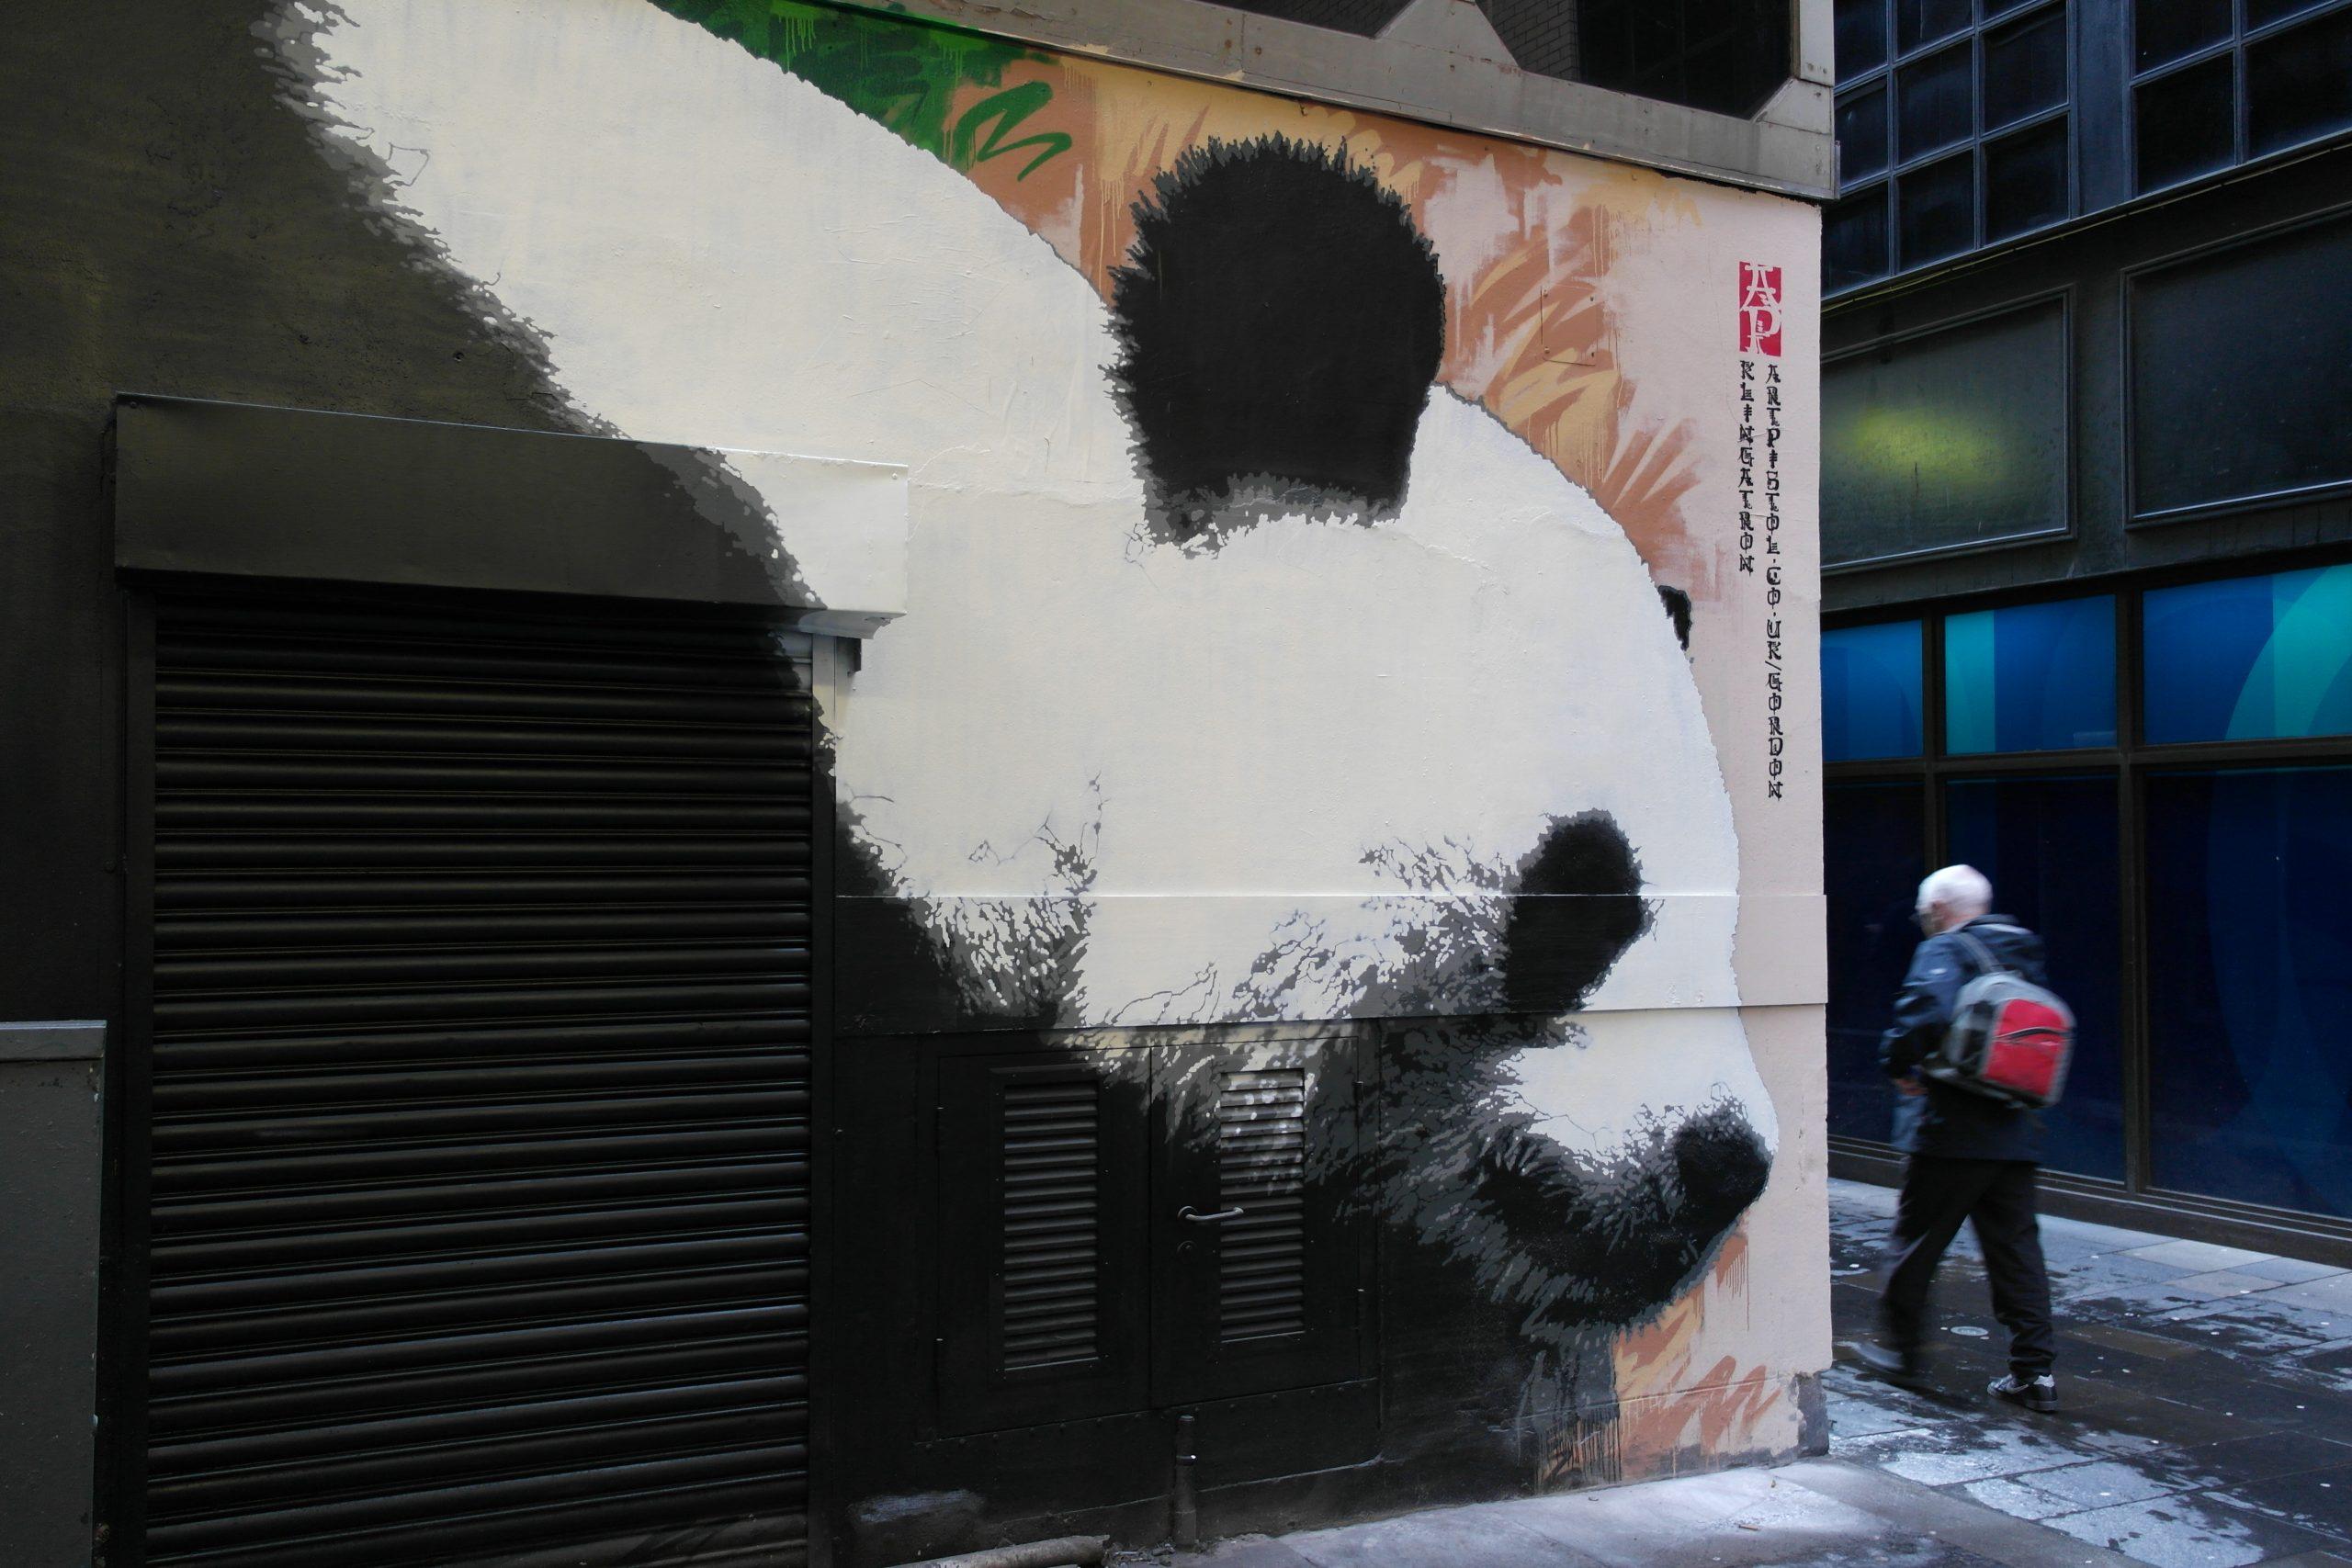 Glasgow Panda street art